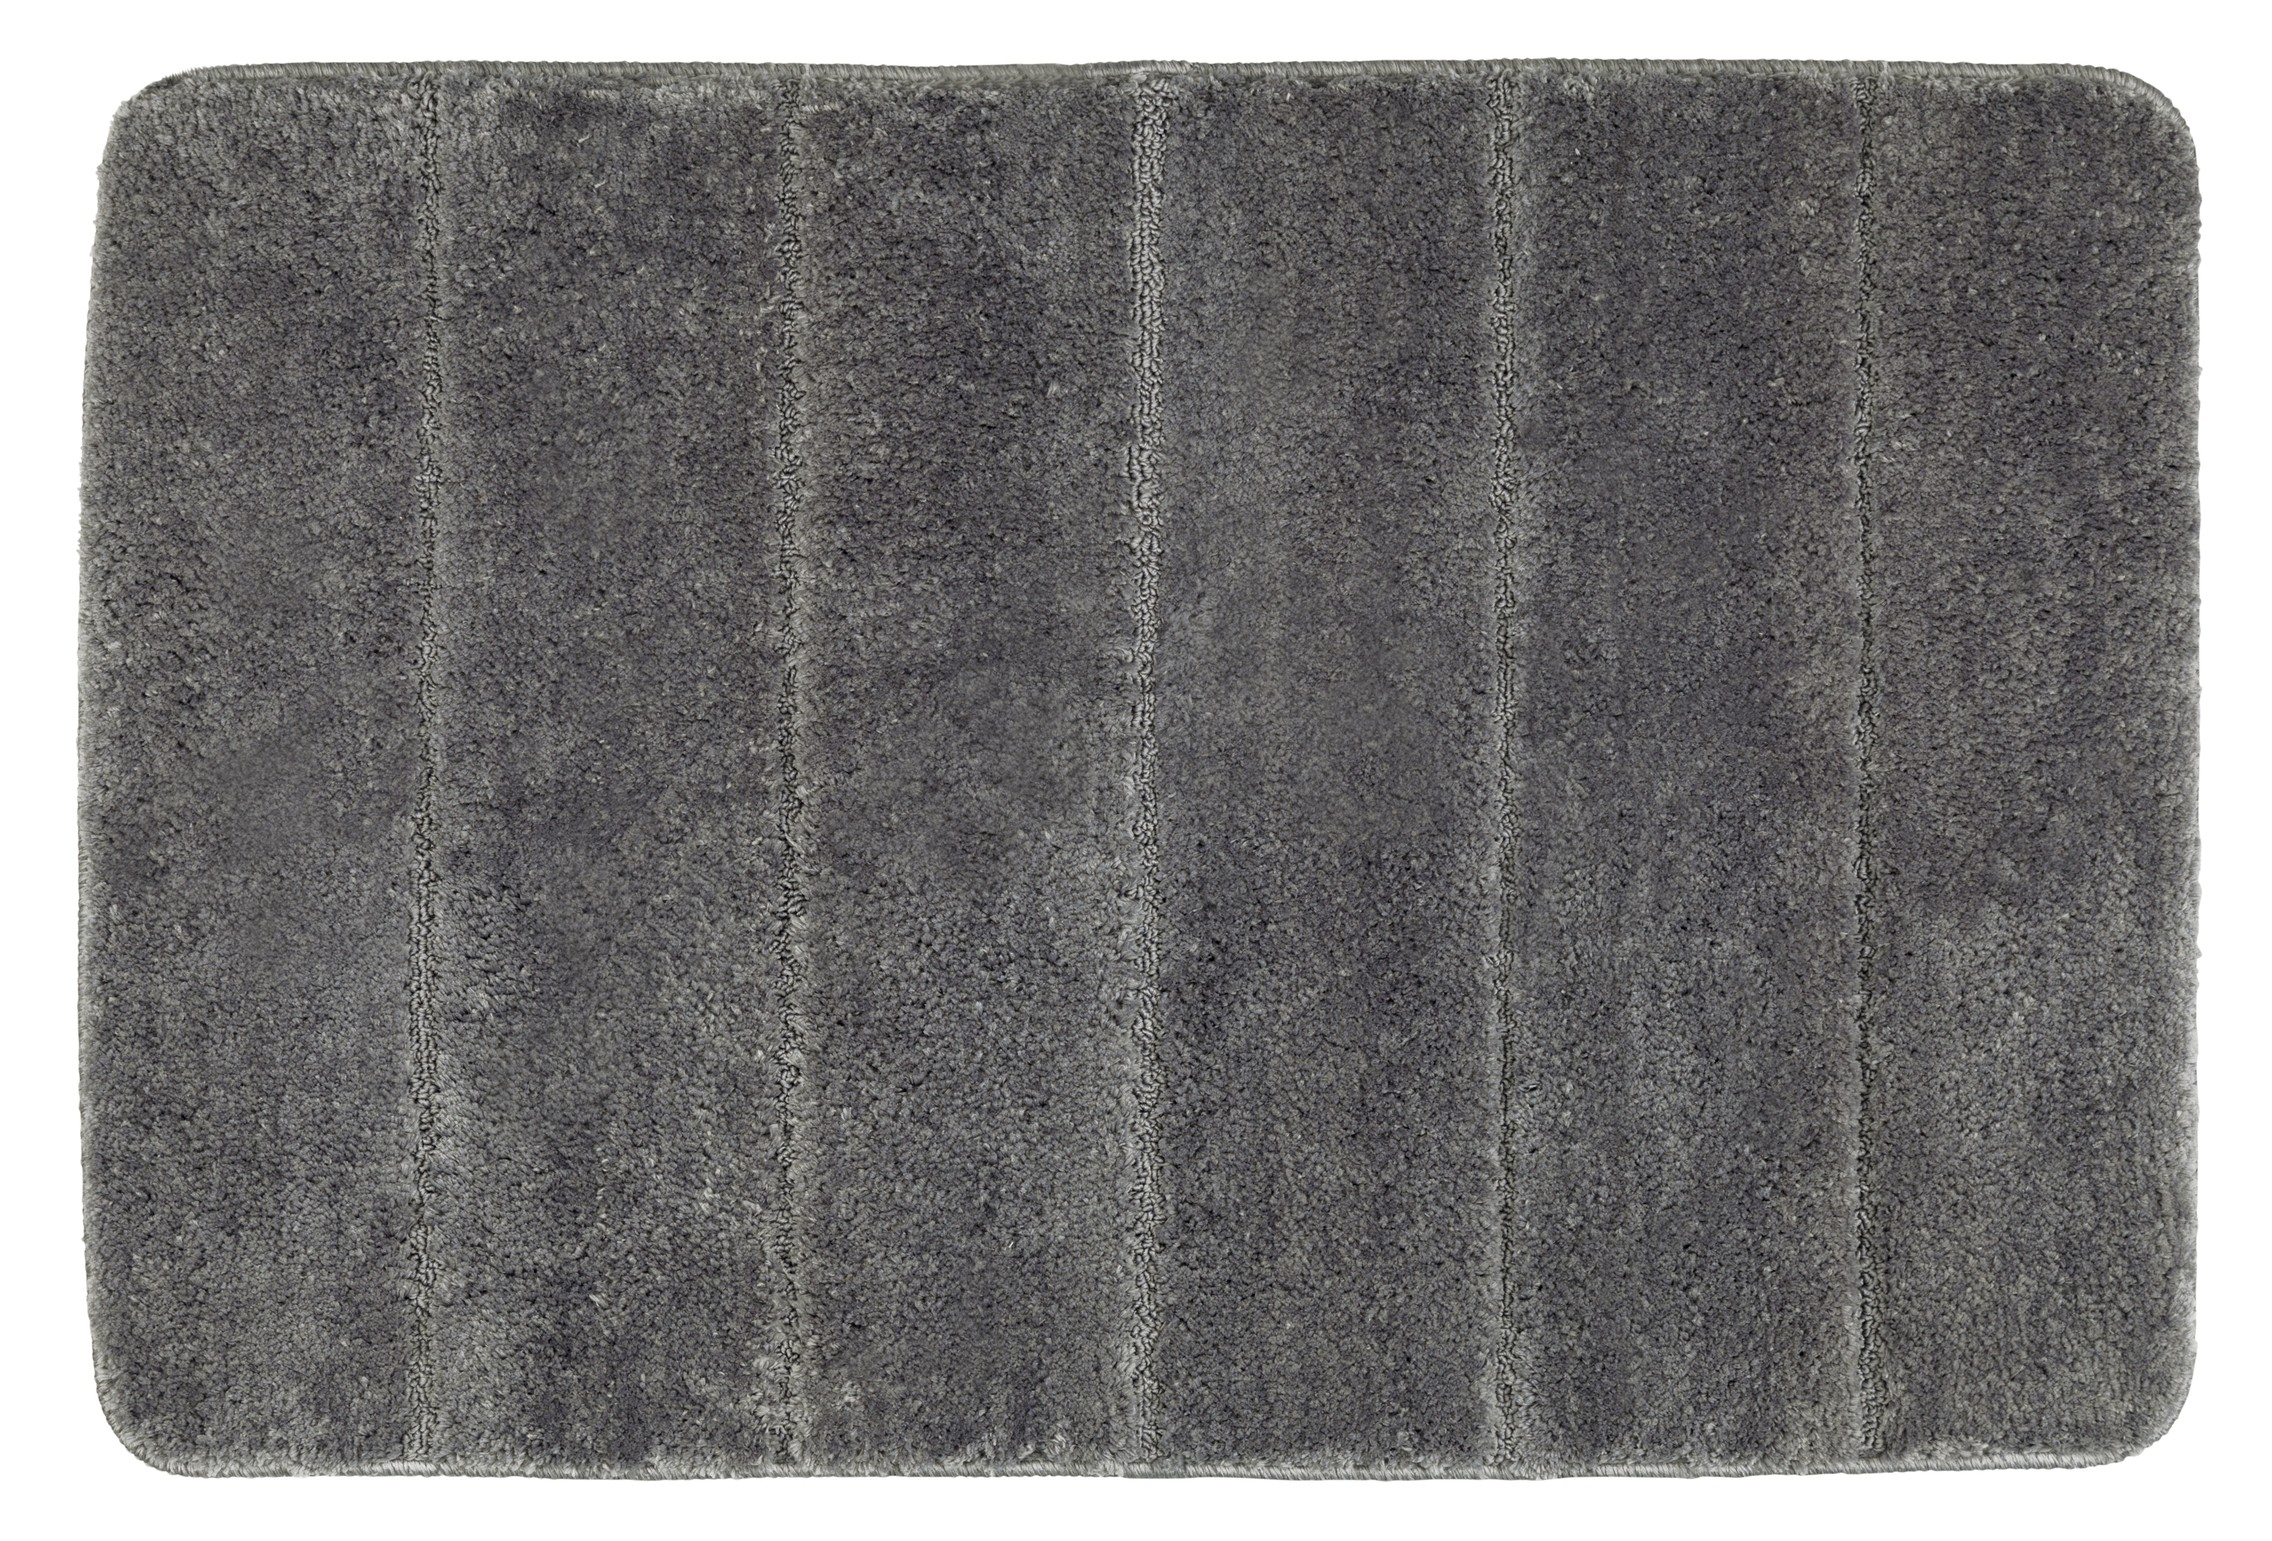 Wenko Badteppich Steps Mouse Grey, 60 x 90 cm, Mikrofaser